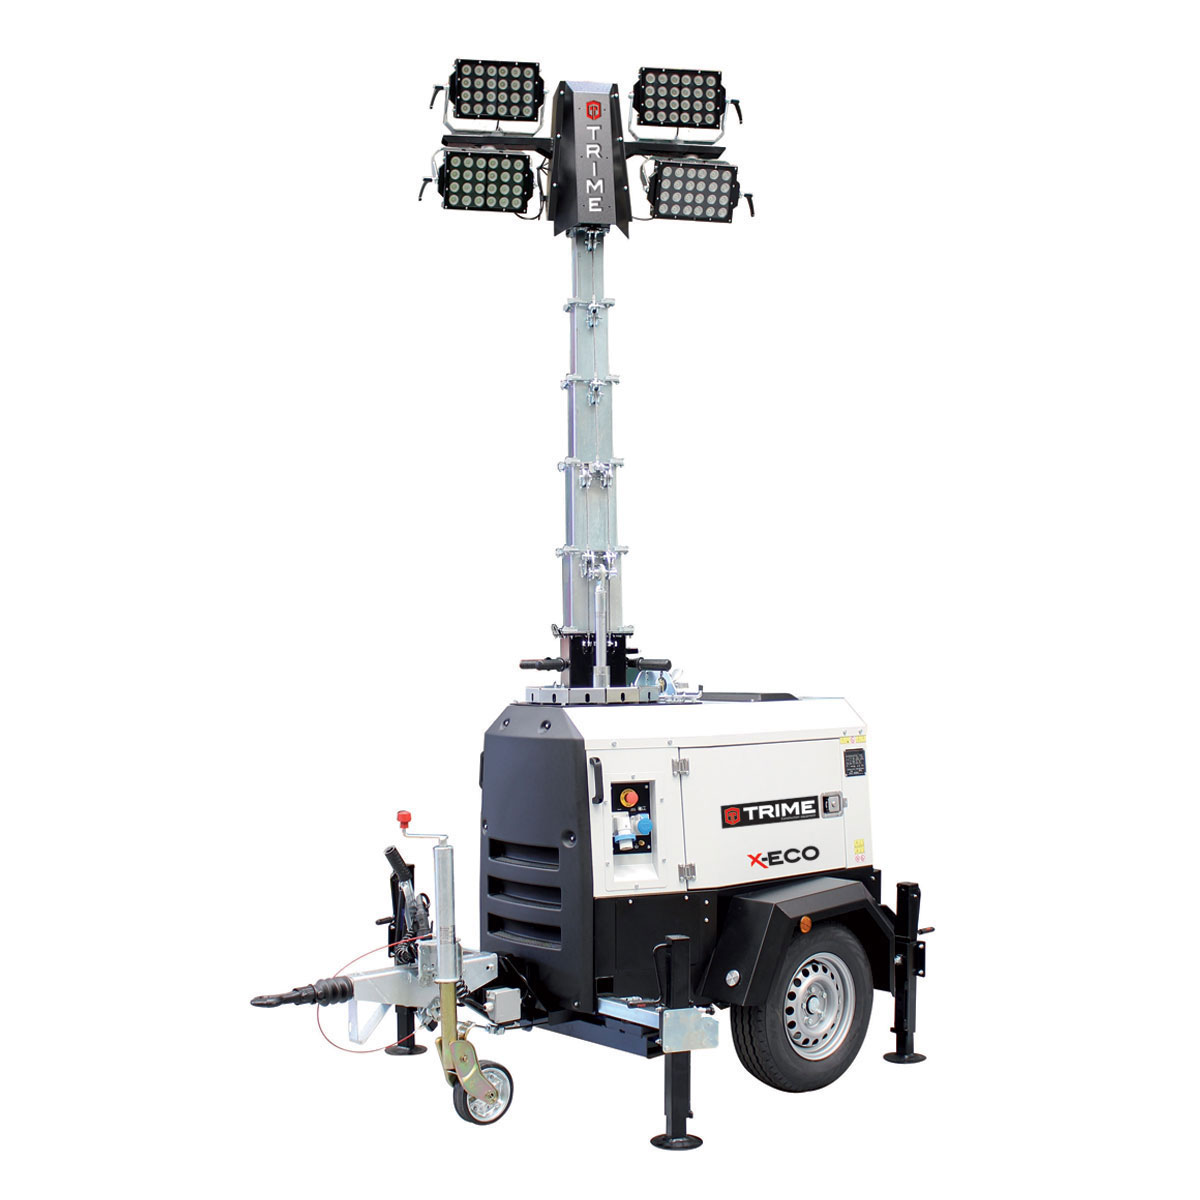 prozektoru-masts-led-x-eco-4x300W-48V-atverta-pozicija